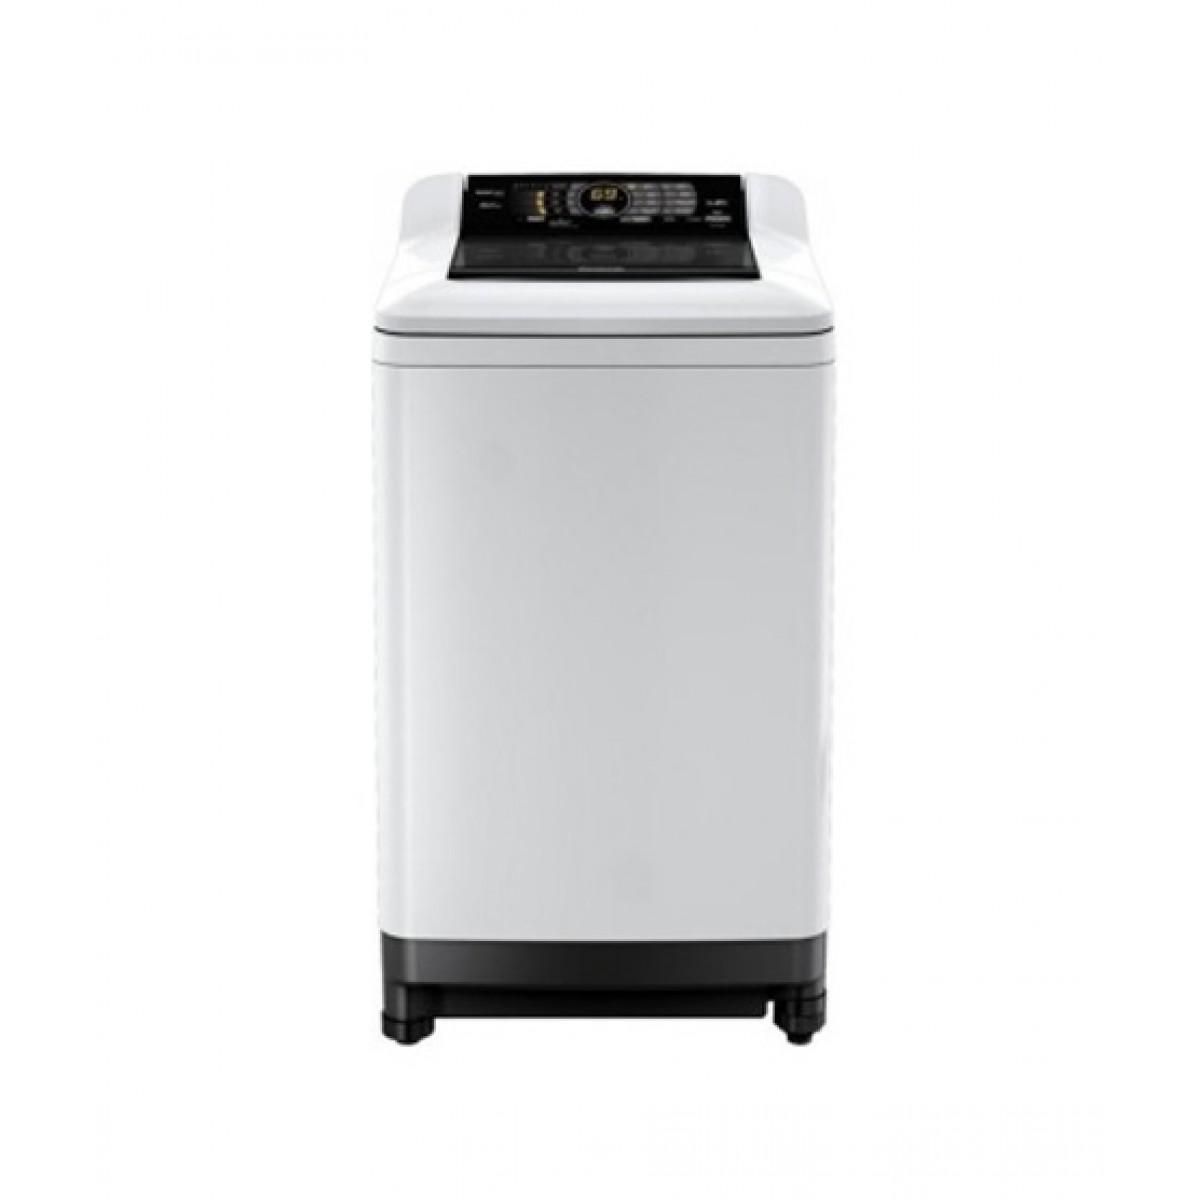 Panasonic Top Load Fully Automatic Washing Machine 9 Kg (NA-F90A1)